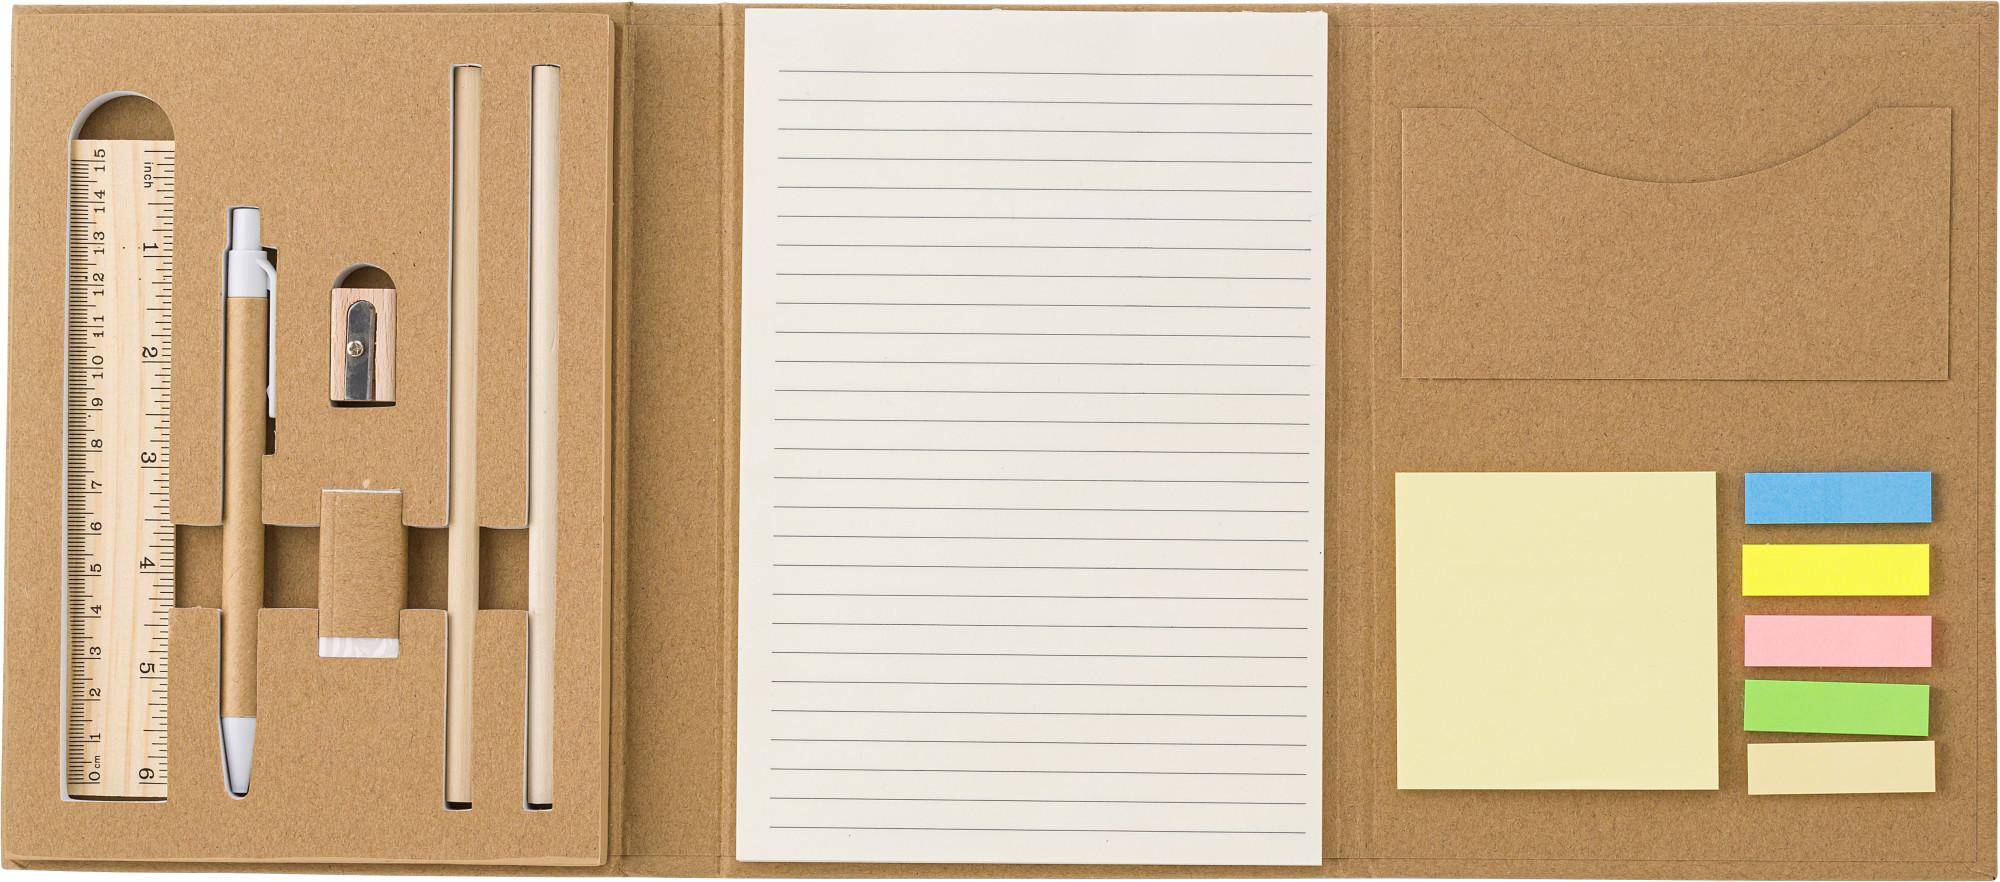 Conférencier en carton avec bloc-notes  - 19-1280-2